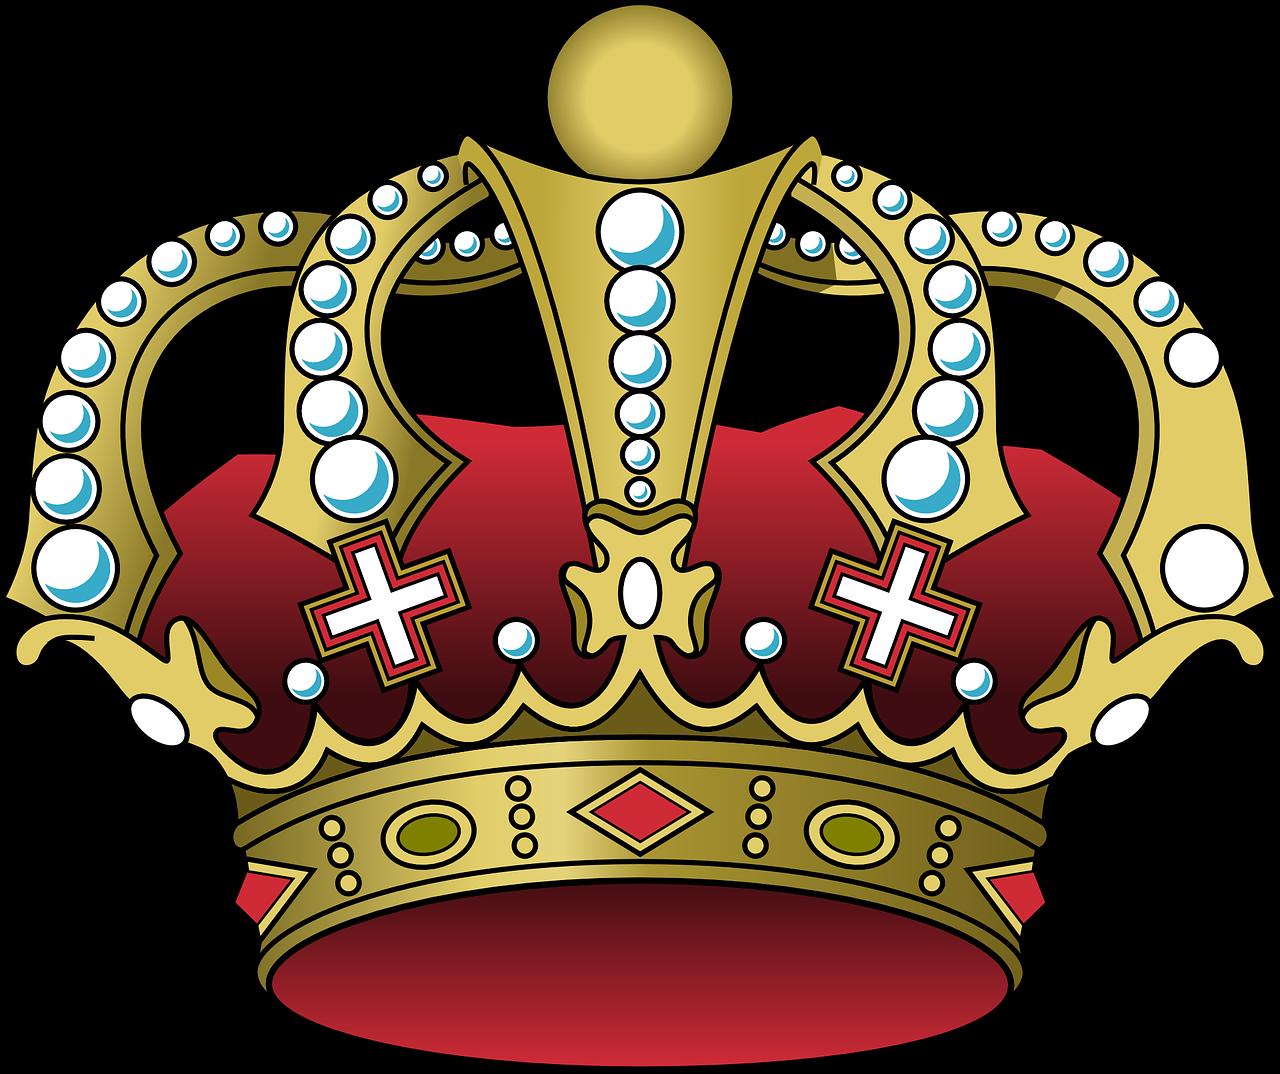 Bianca Ingrossos kungliga dilemma